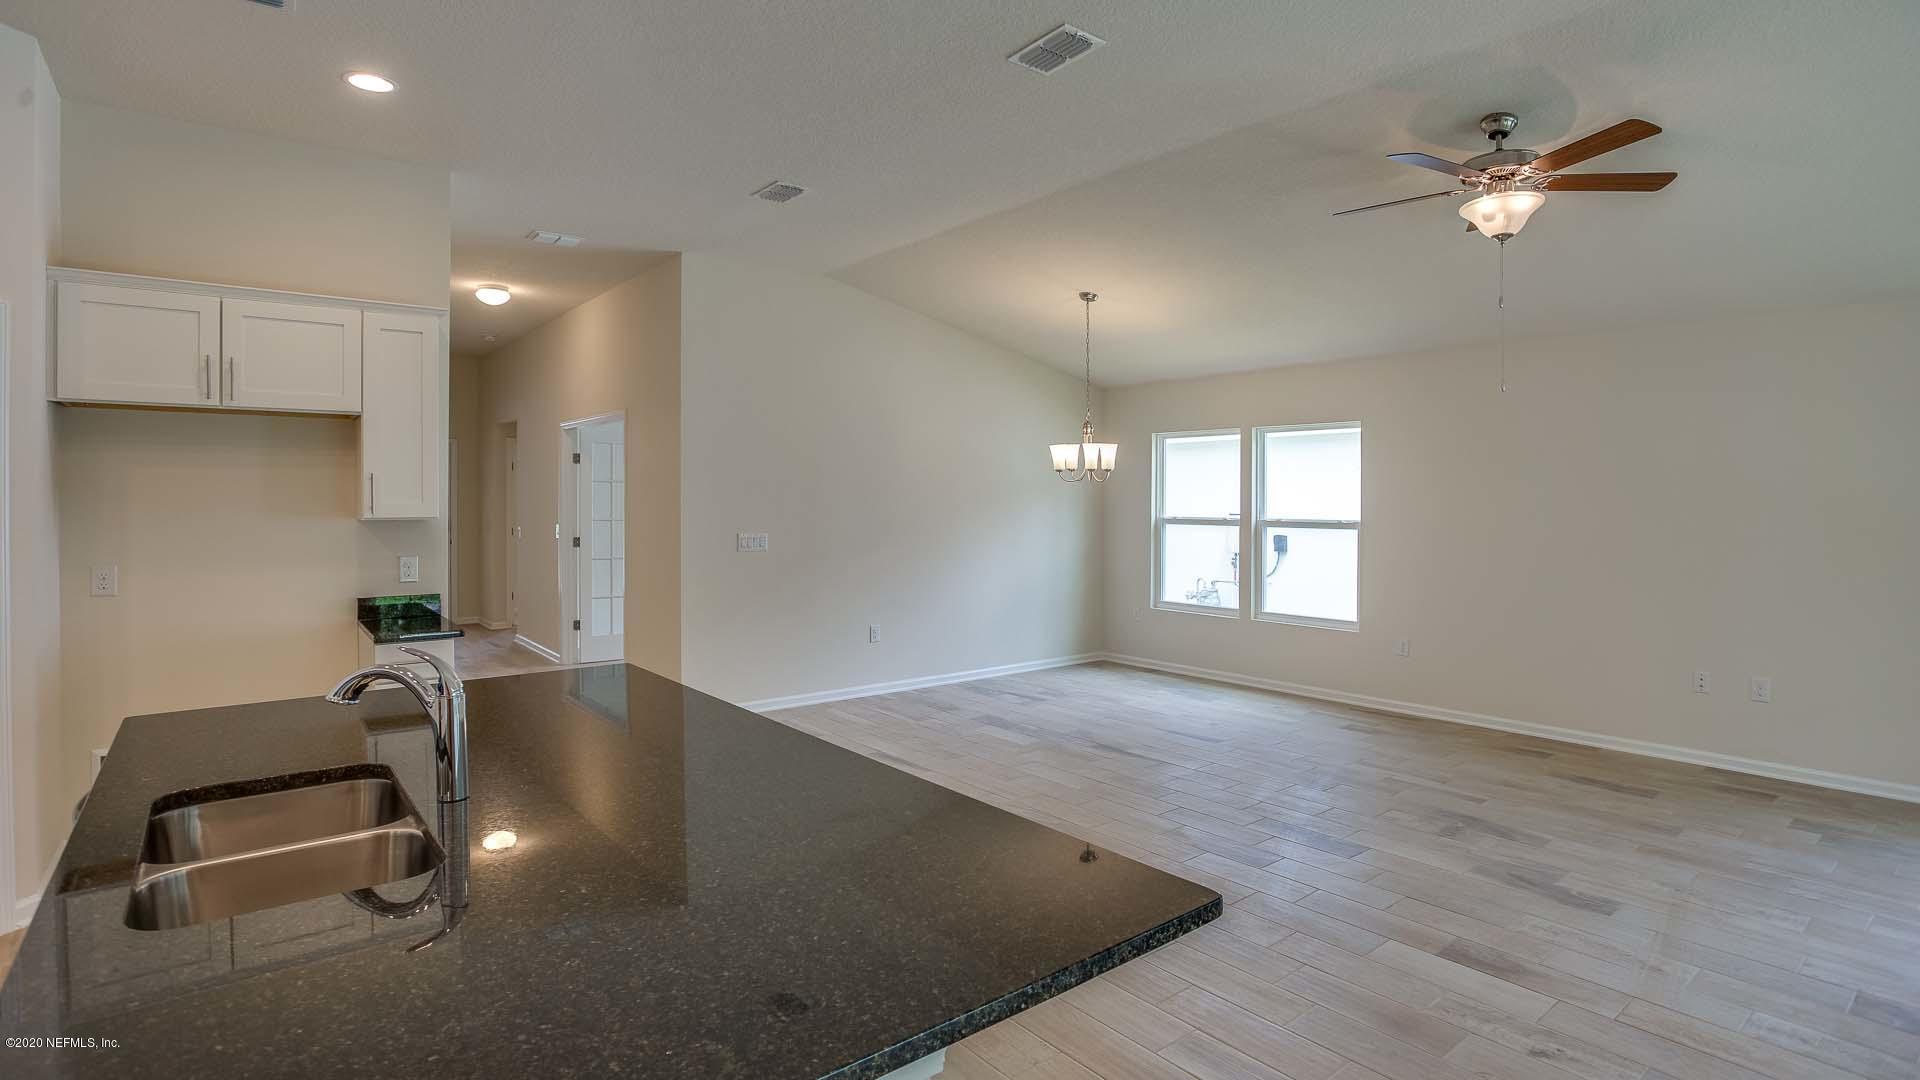 29 BIRDIE, BUNNELL, FLORIDA 32110, 3 Bedrooms Bedrooms, ,2 BathroomsBathrooms,Residential,For sale,BIRDIE,1052041